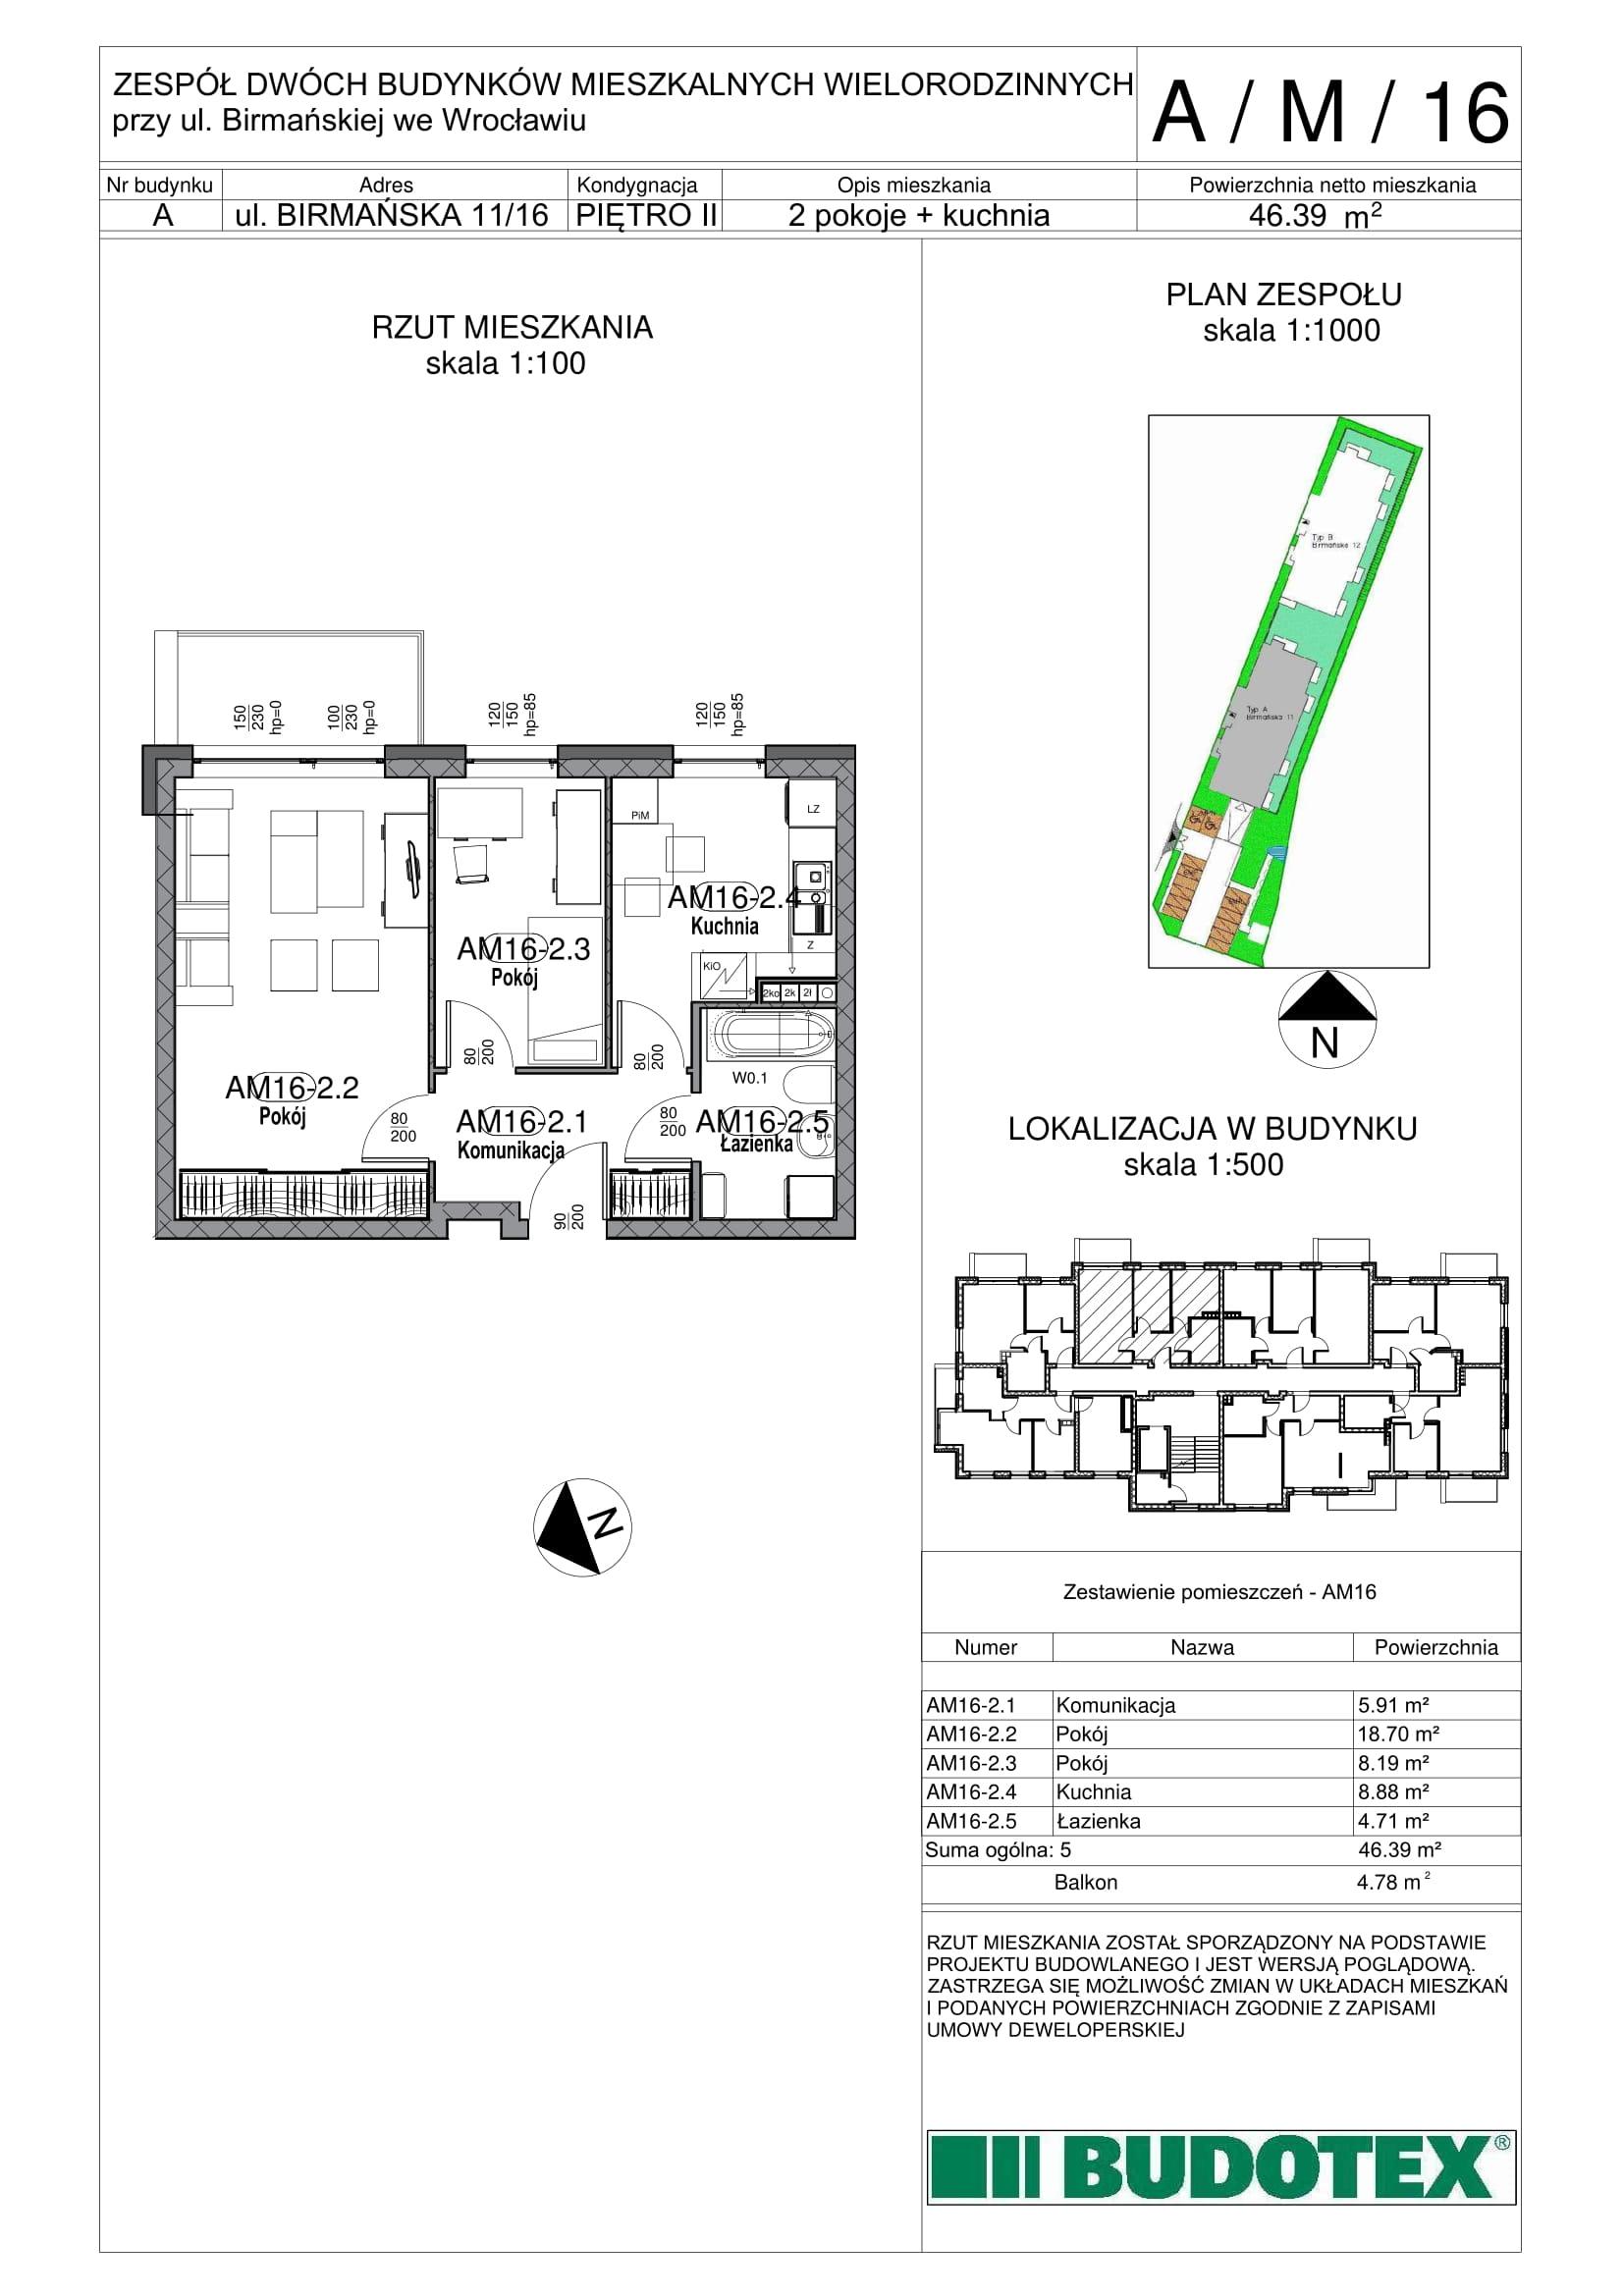 Mieszkanie nr A/M/16